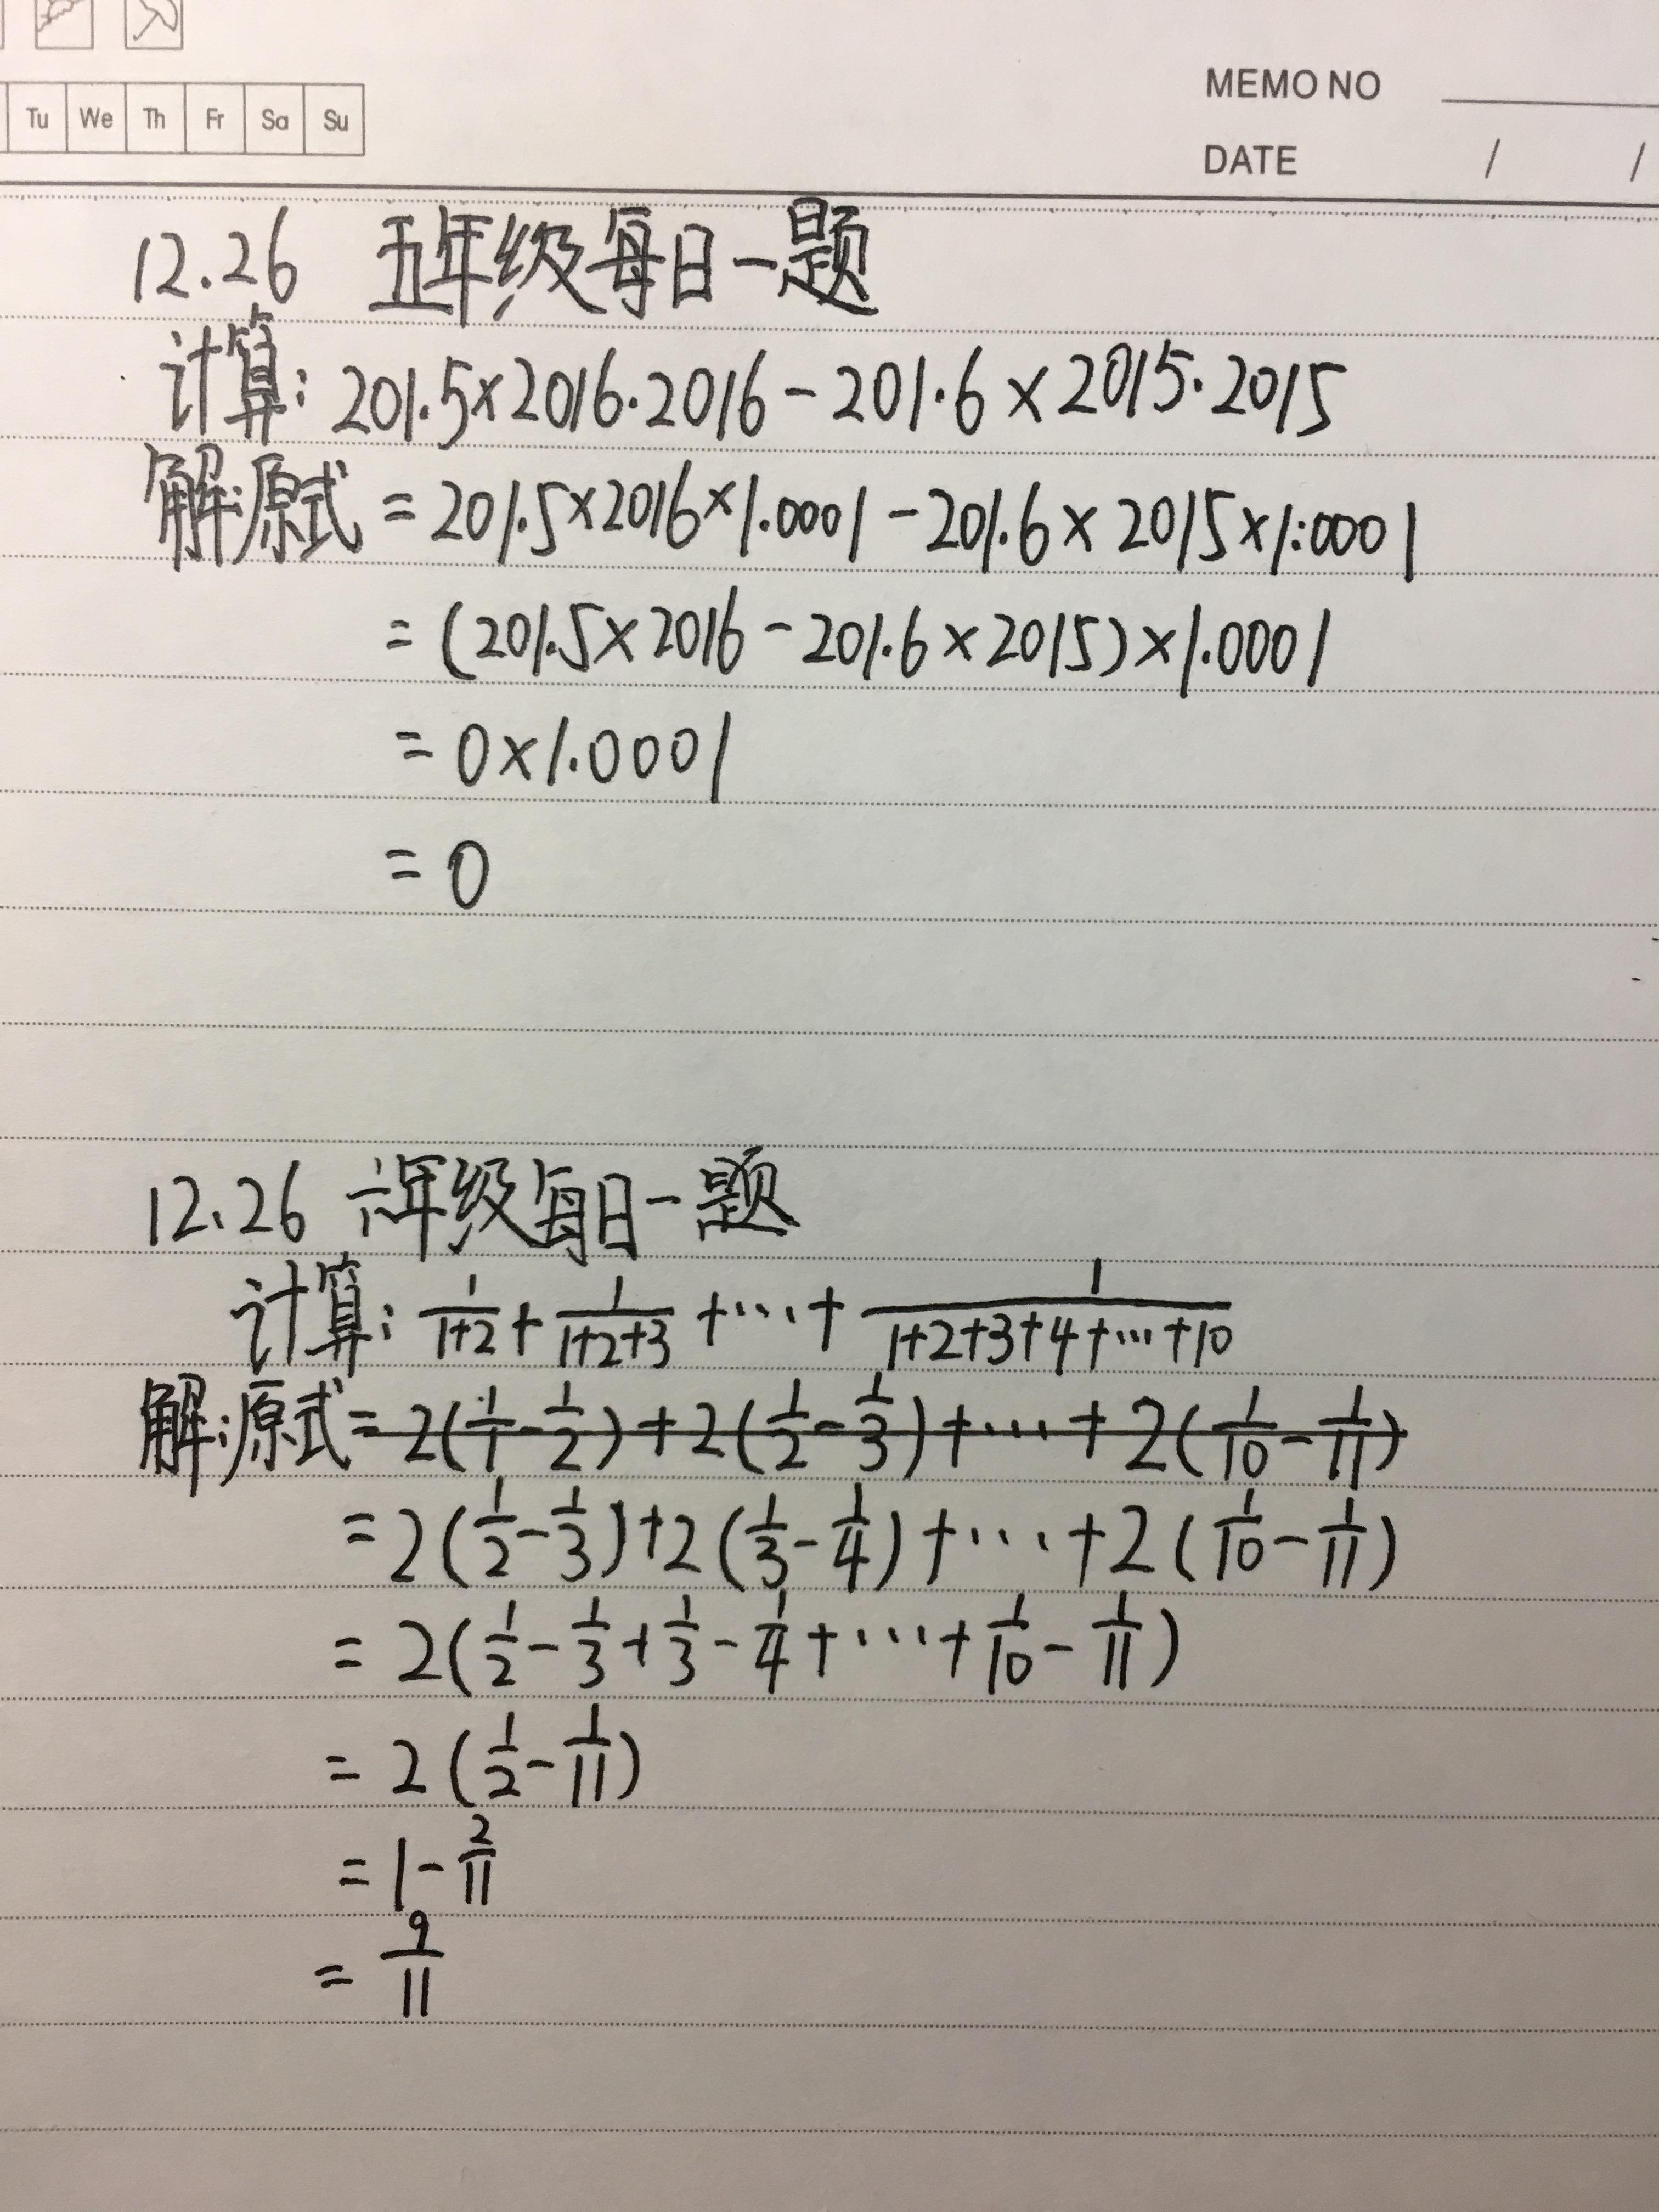 BD8D4FA4-4C92-46A8-912C-829E6825D18A.jpg